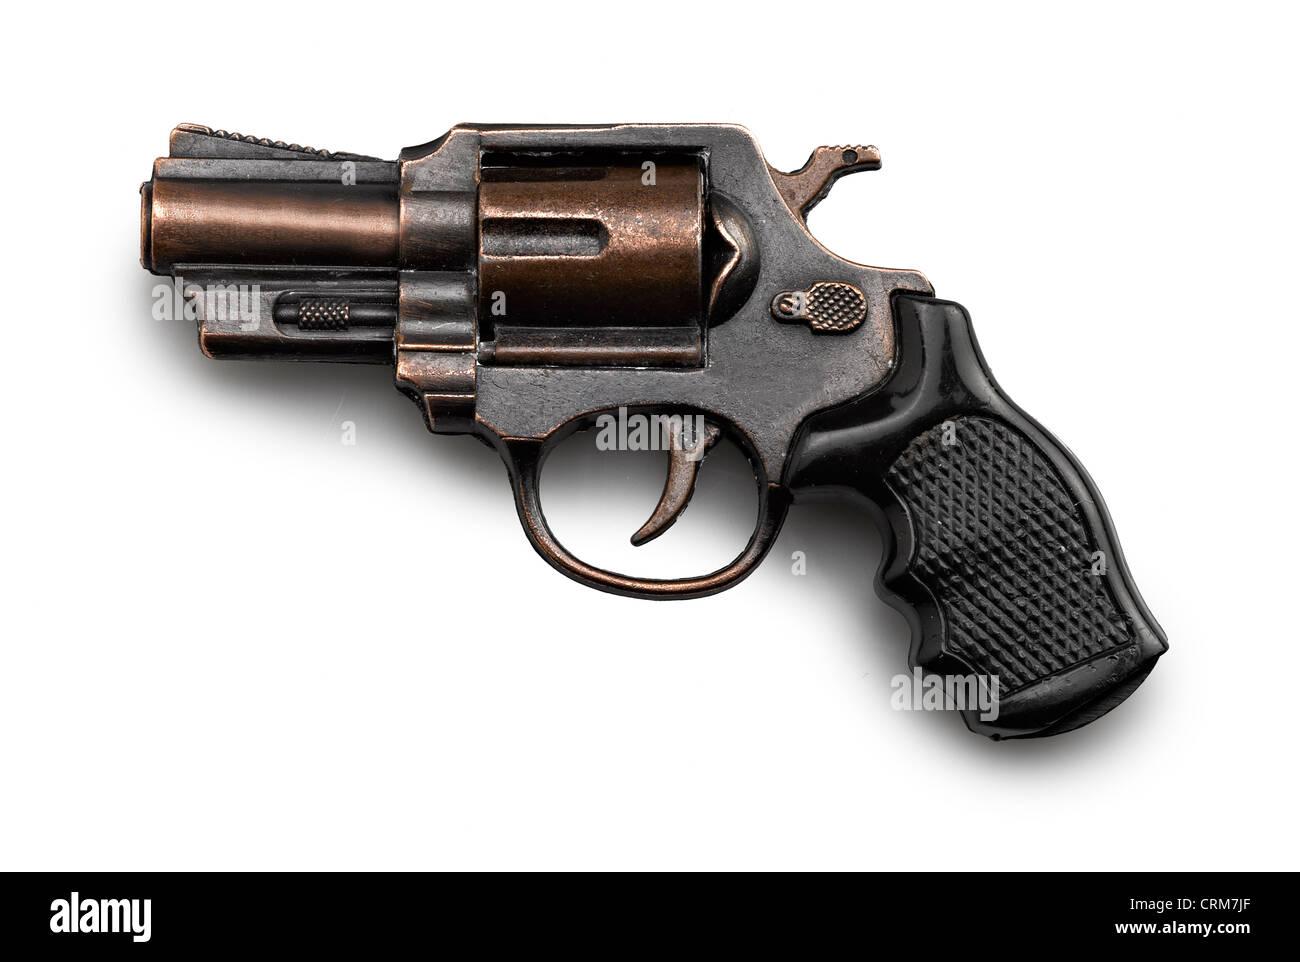 Revolver Gun, toy for children - Stock Image